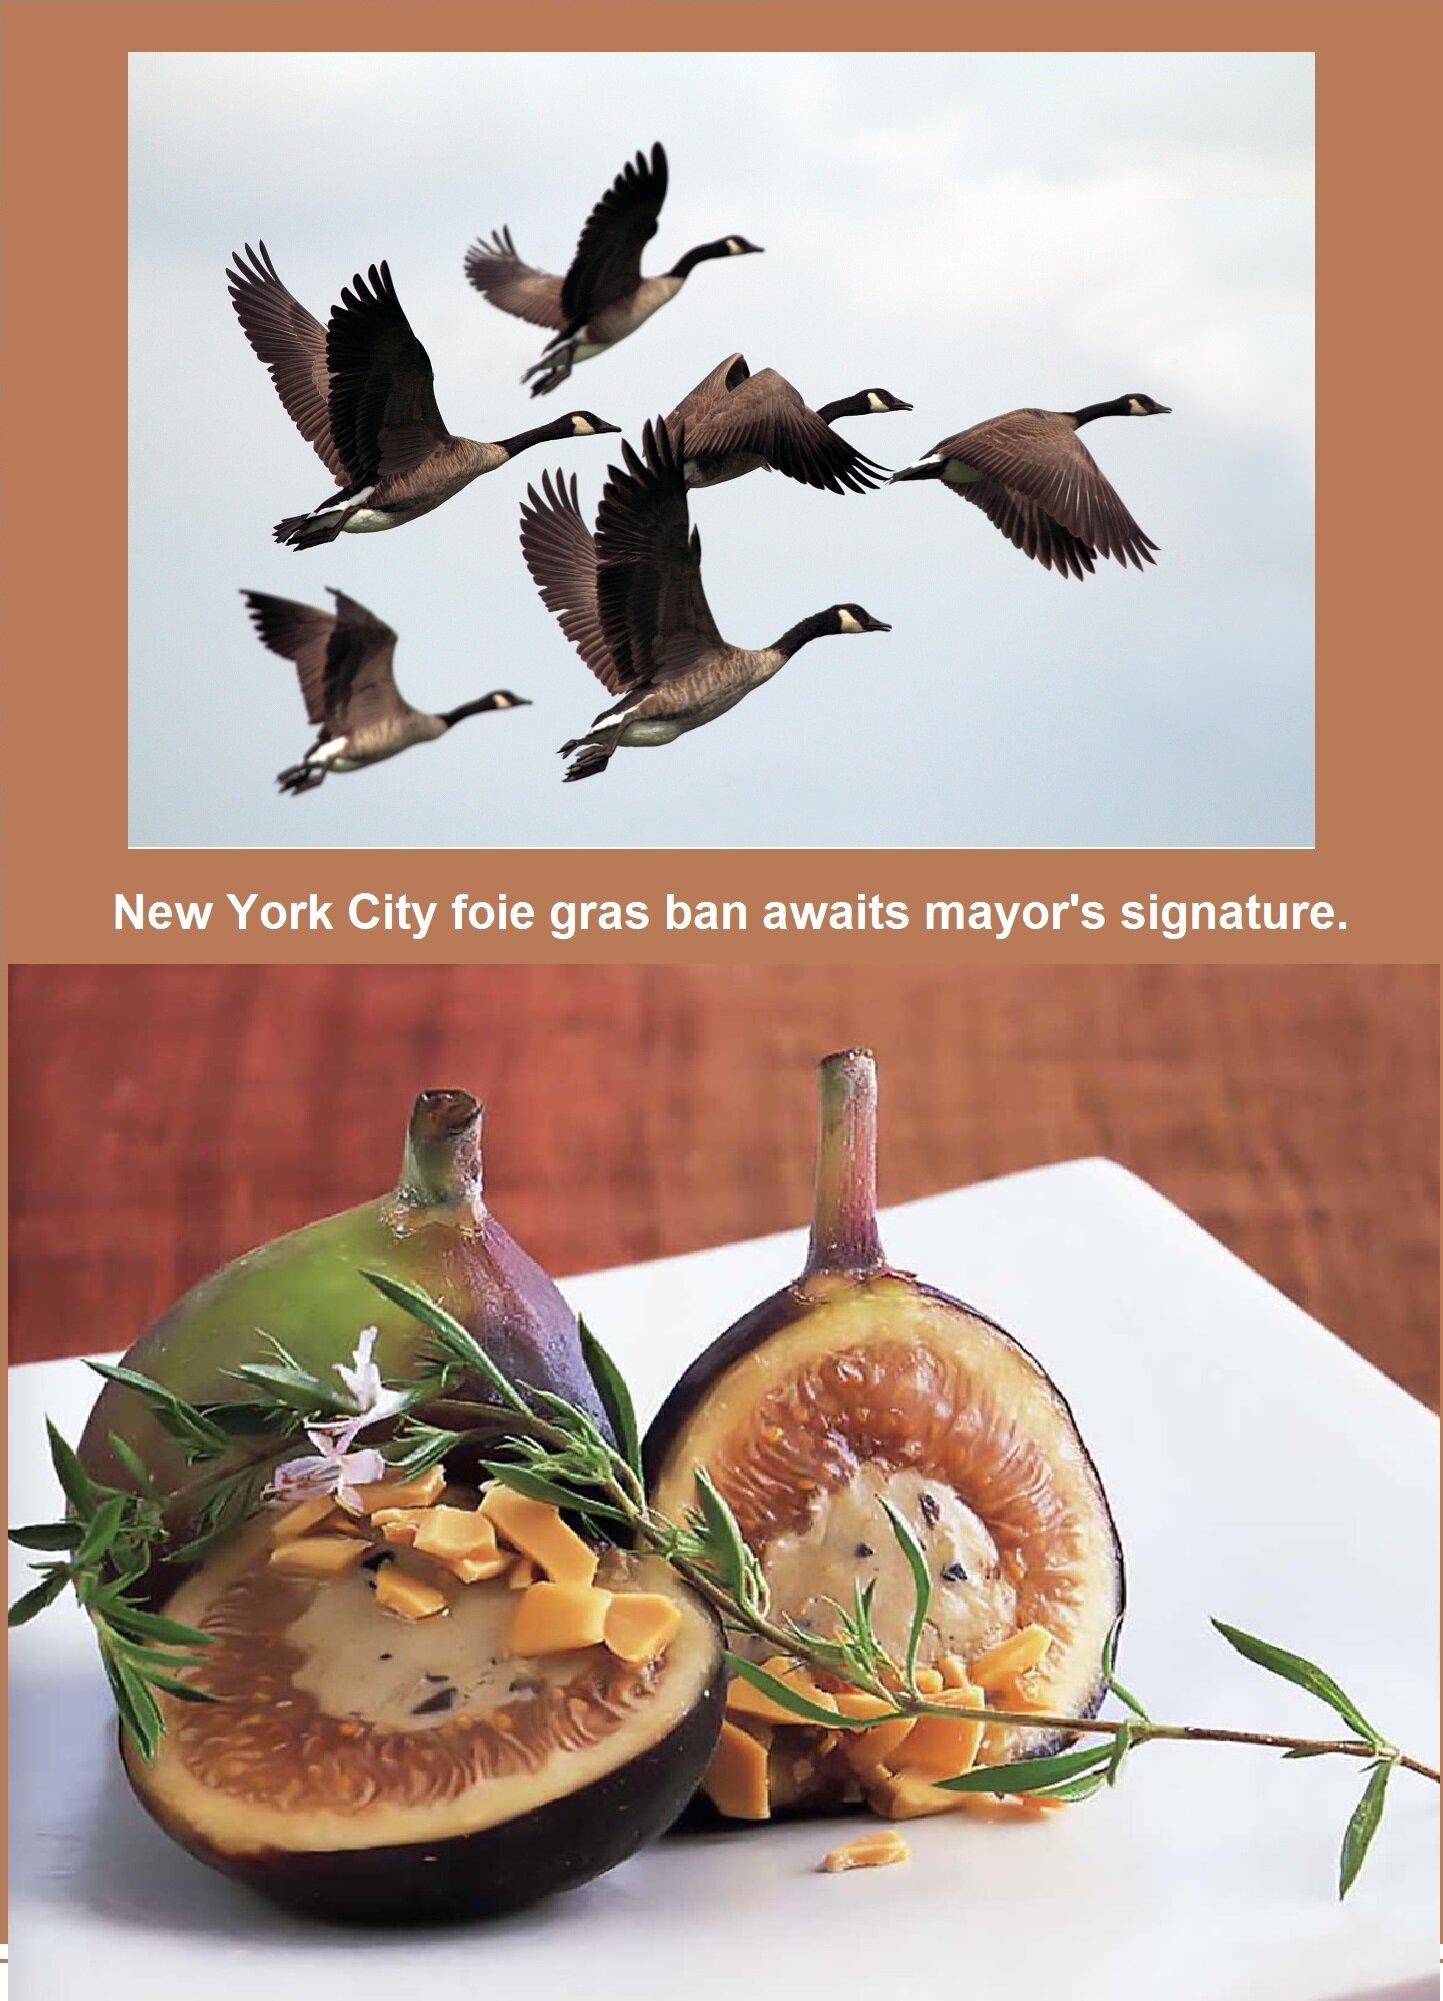 Image Credits: Top Photo by  Gary Bendig  on  Unsplash ; Bottom  Culinaria.